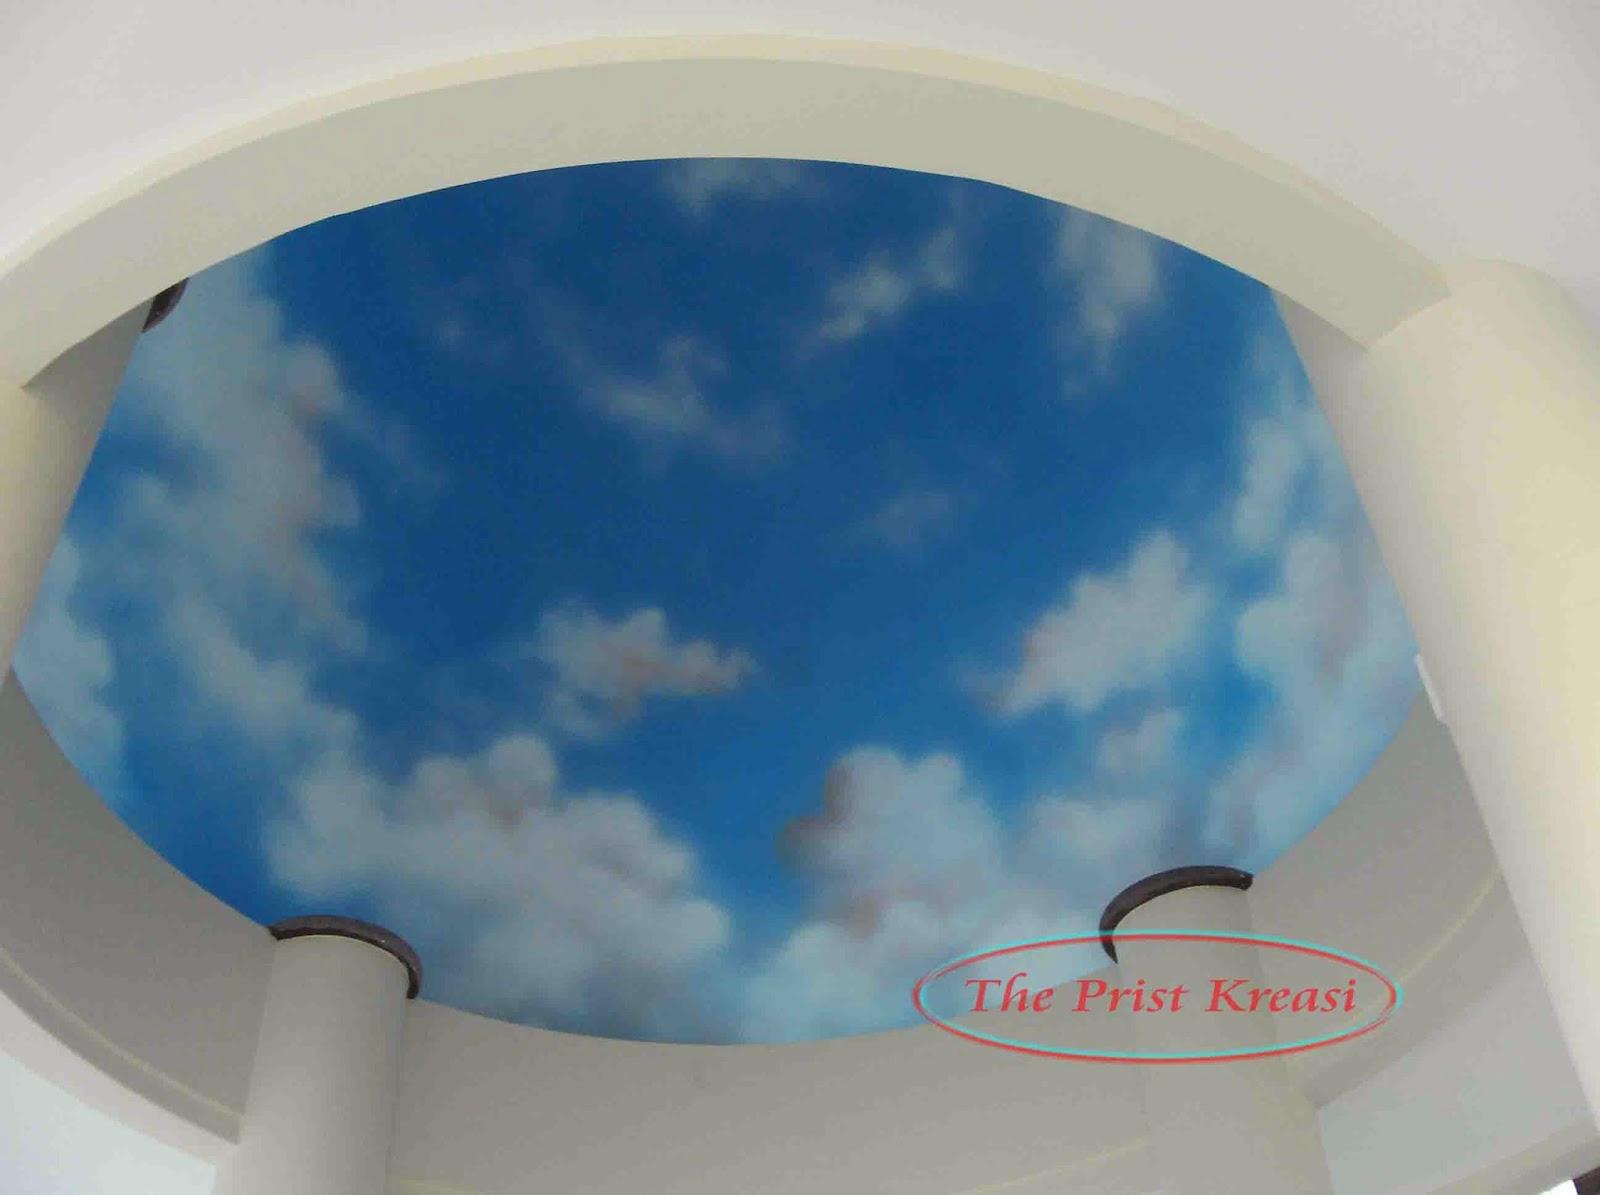 yakni cara atau tehnik mempercantik sebuah plafon  gypsum yang kaya akan seni Jasa lukis awan diplafon | plafon lukisan awan